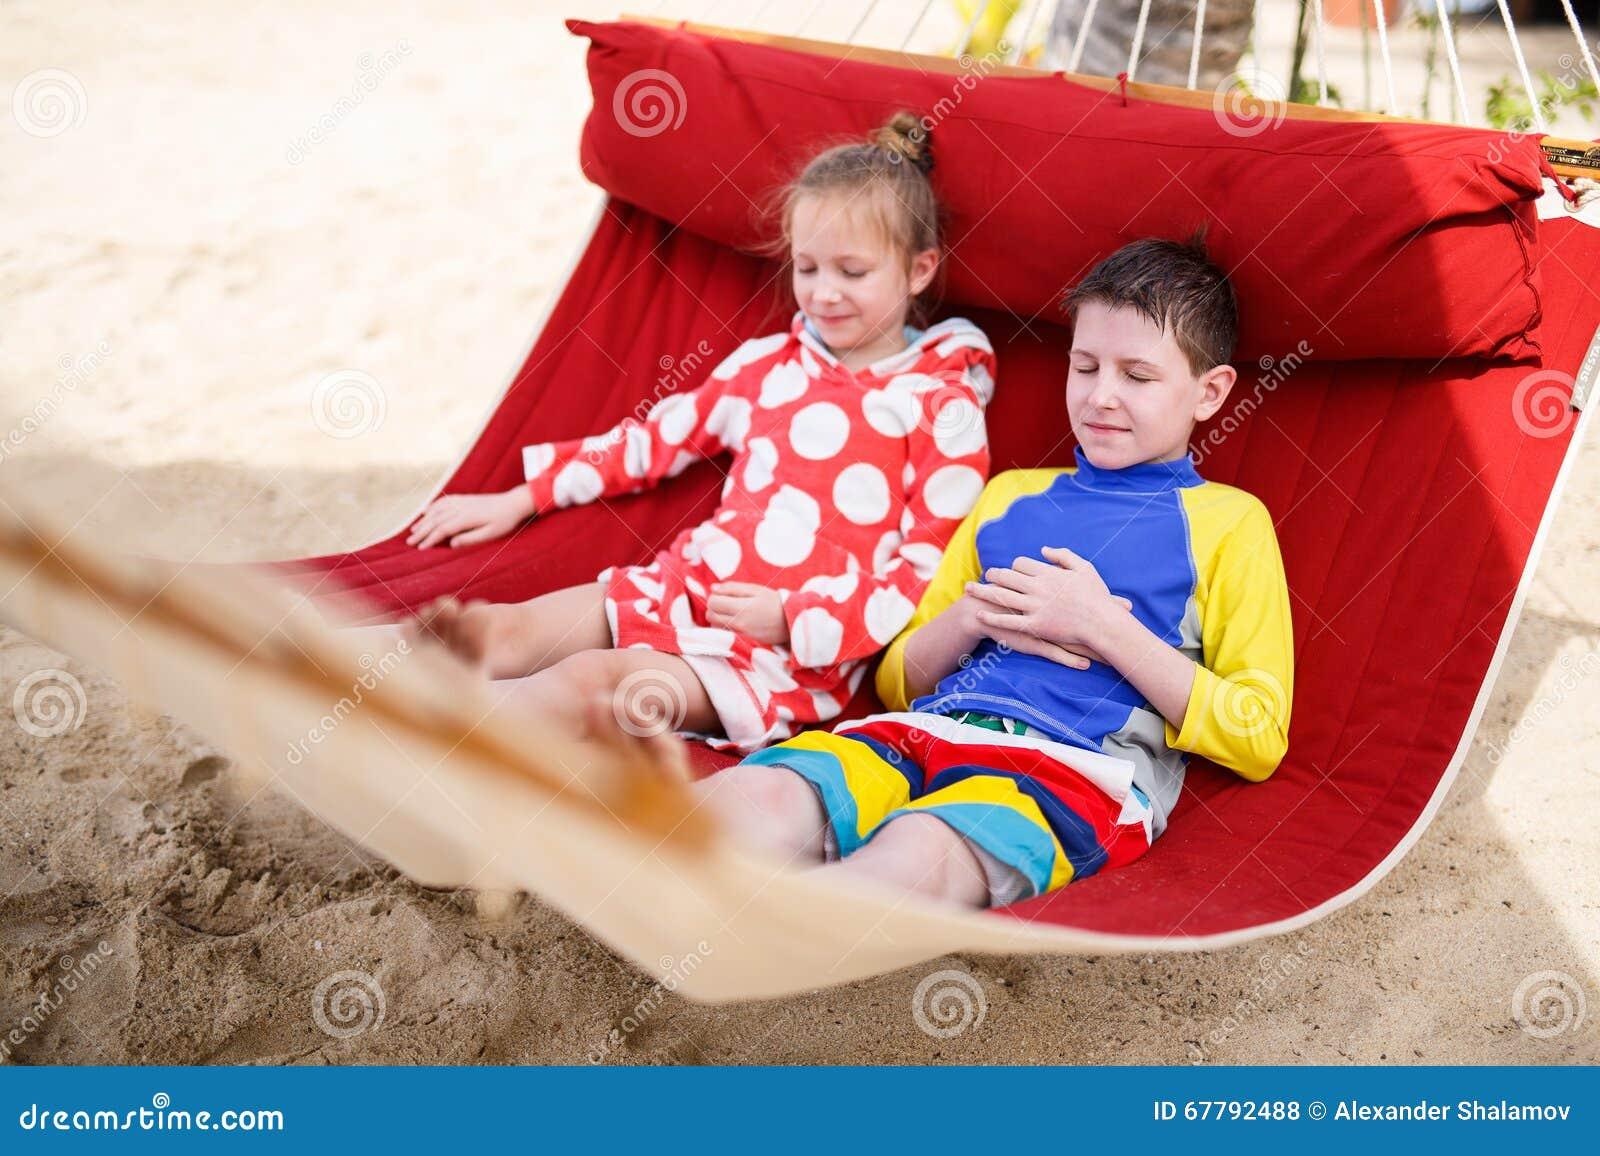 Kids Relaxing In Hammock Stock Photo Image 67792488